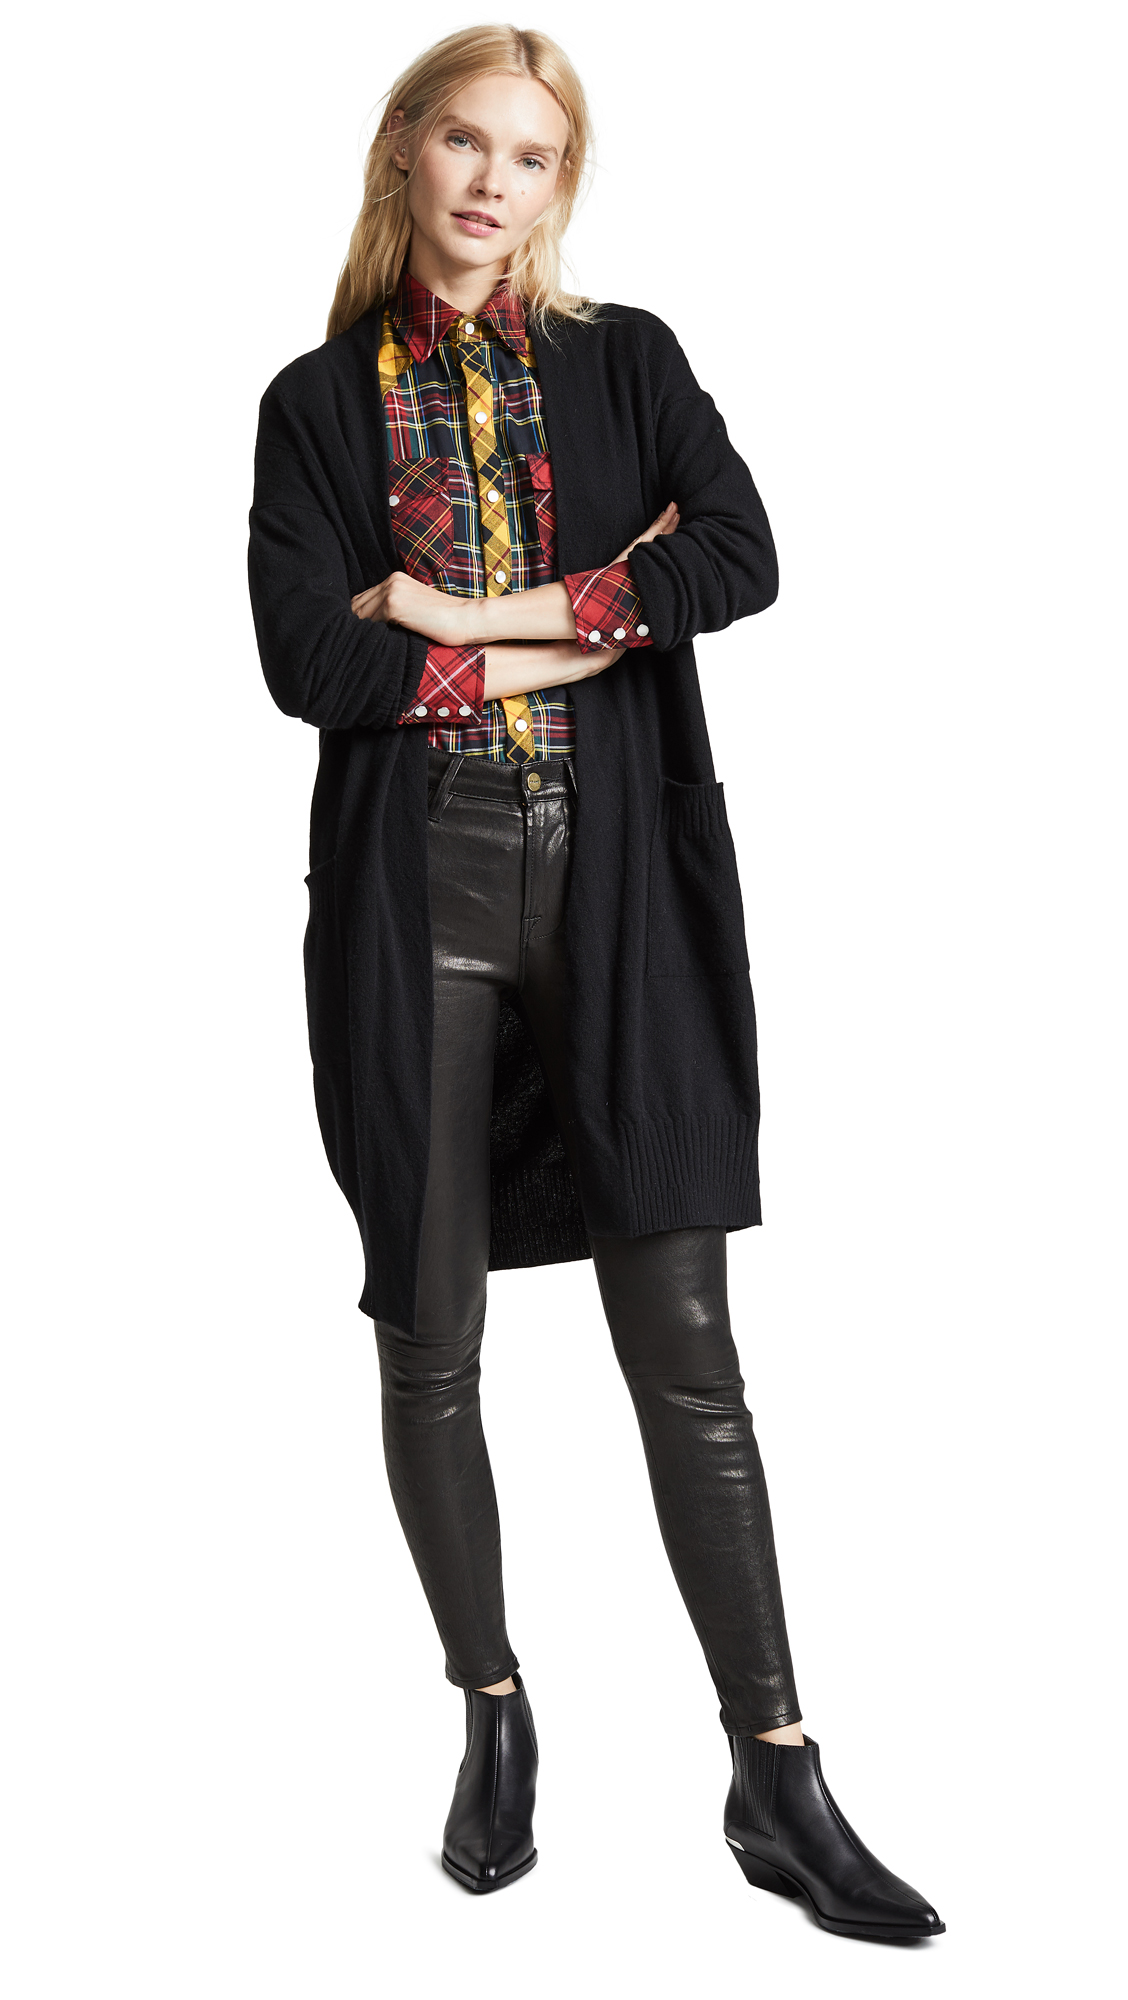 022ad5b4f1 Belstaff Sherdley Cardigan In Black